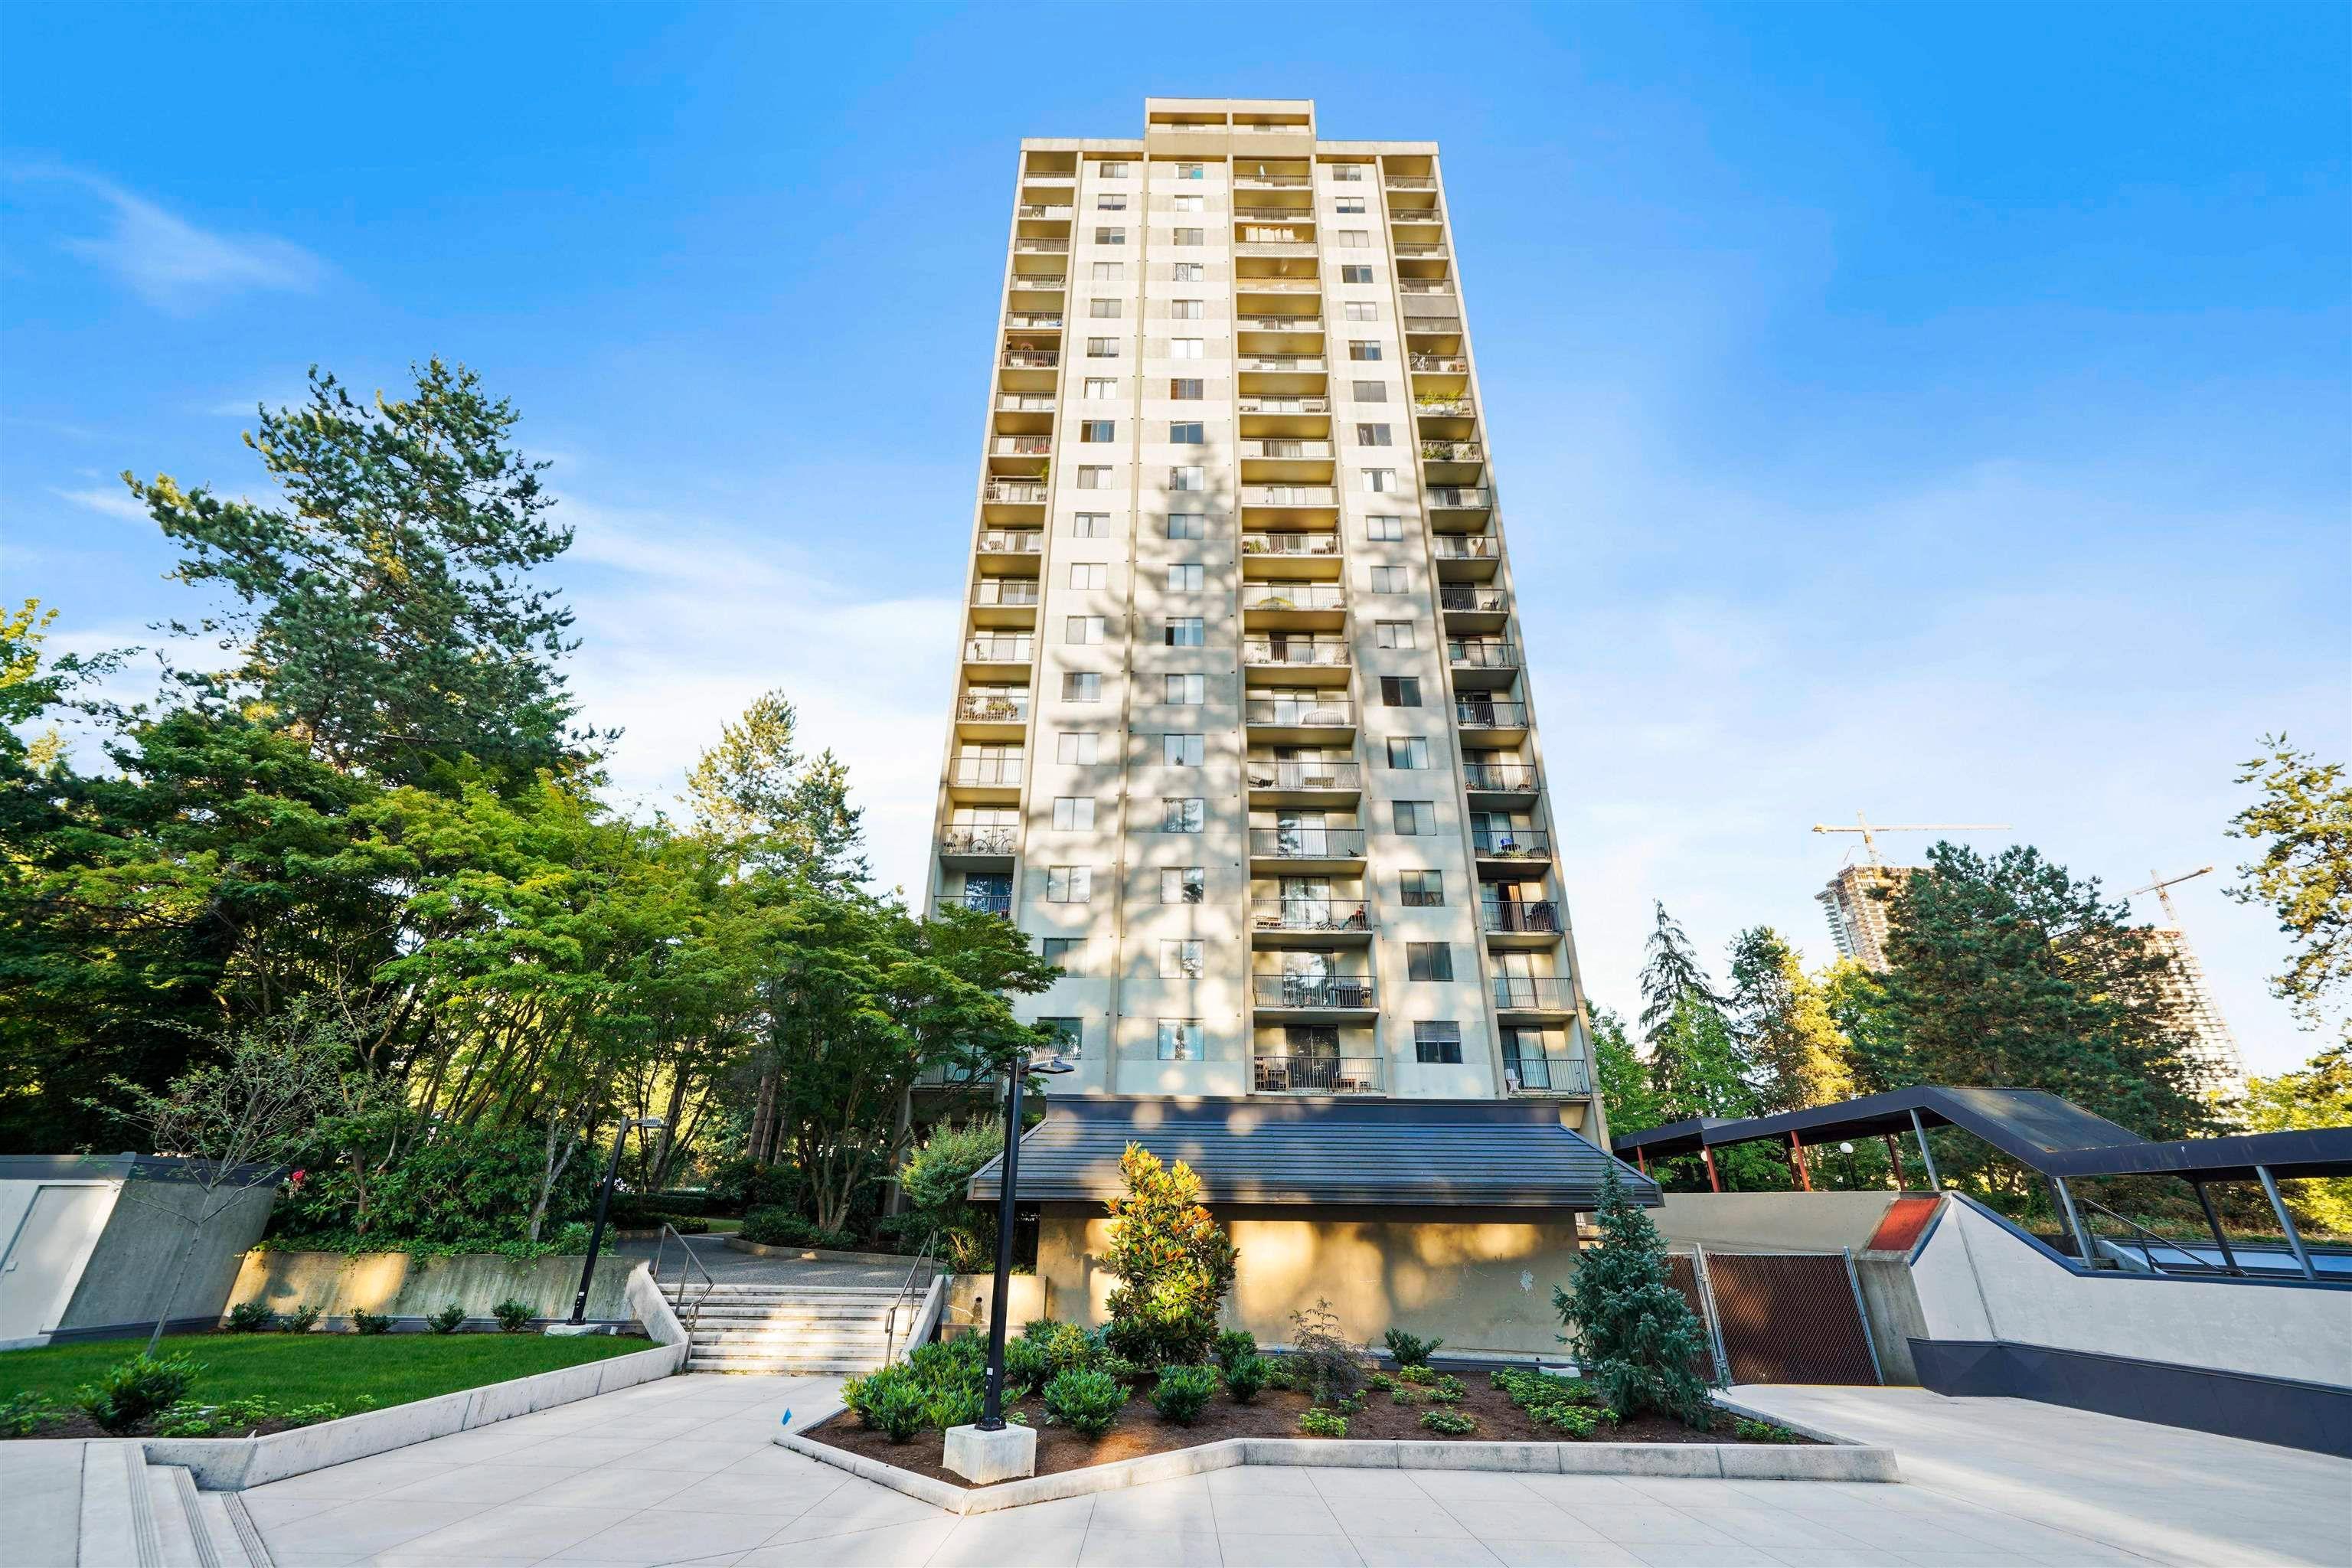 Main Photo: 505 9595 ERICKSON Drive in Burnaby: Sullivan Heights Condo for sale (Burnaby North)  : MLS®# R2621758